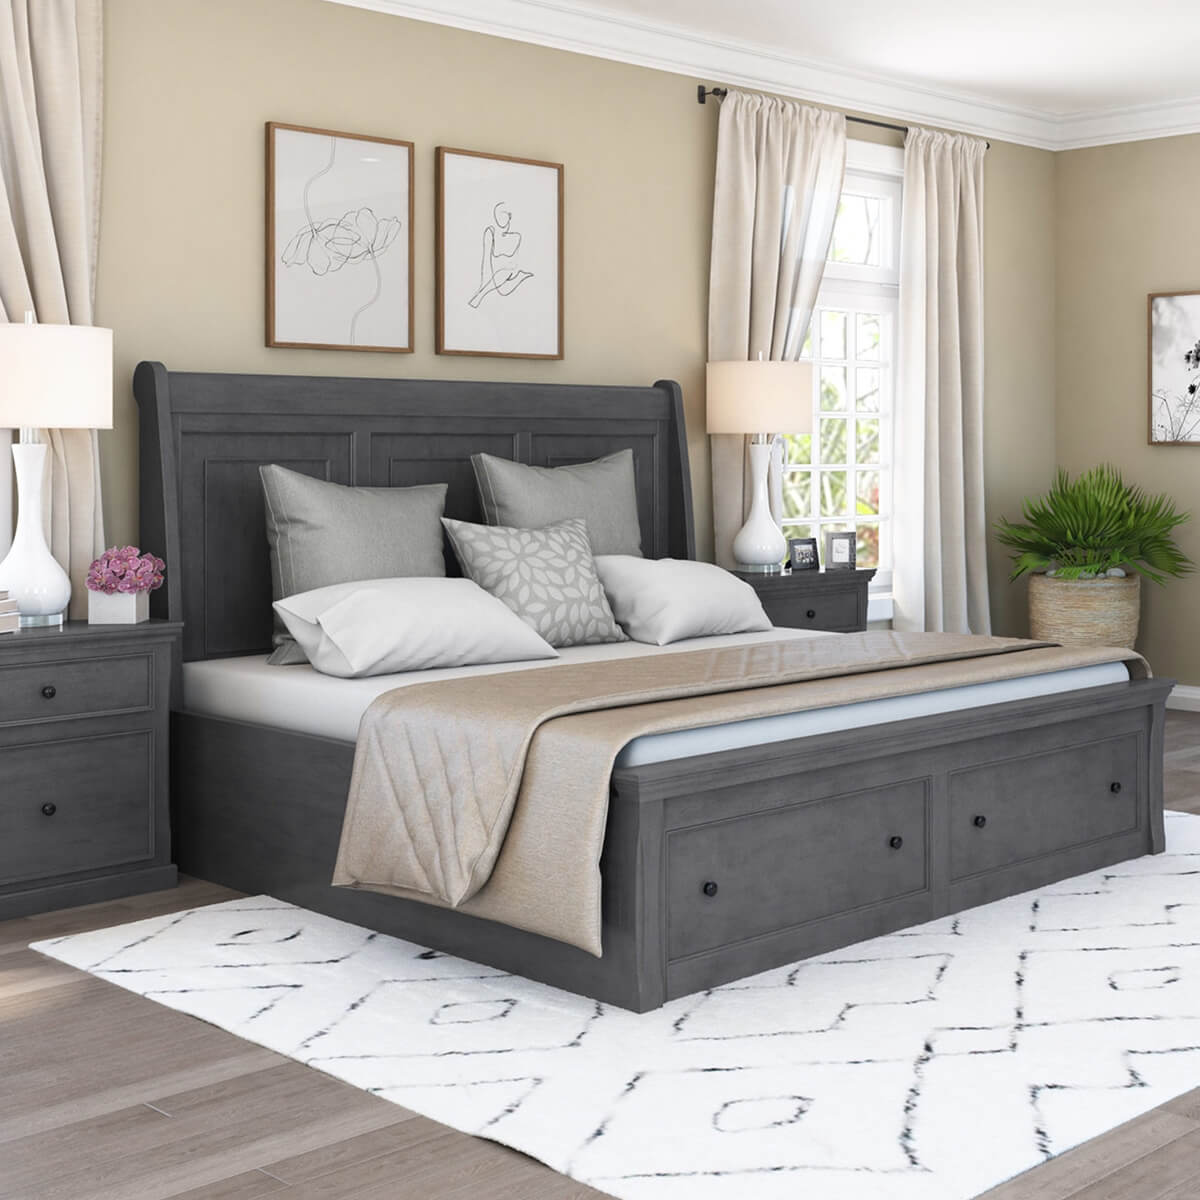 Kelowna Solid Mahogany Wood Gray Storage Platform Bed With Headboard